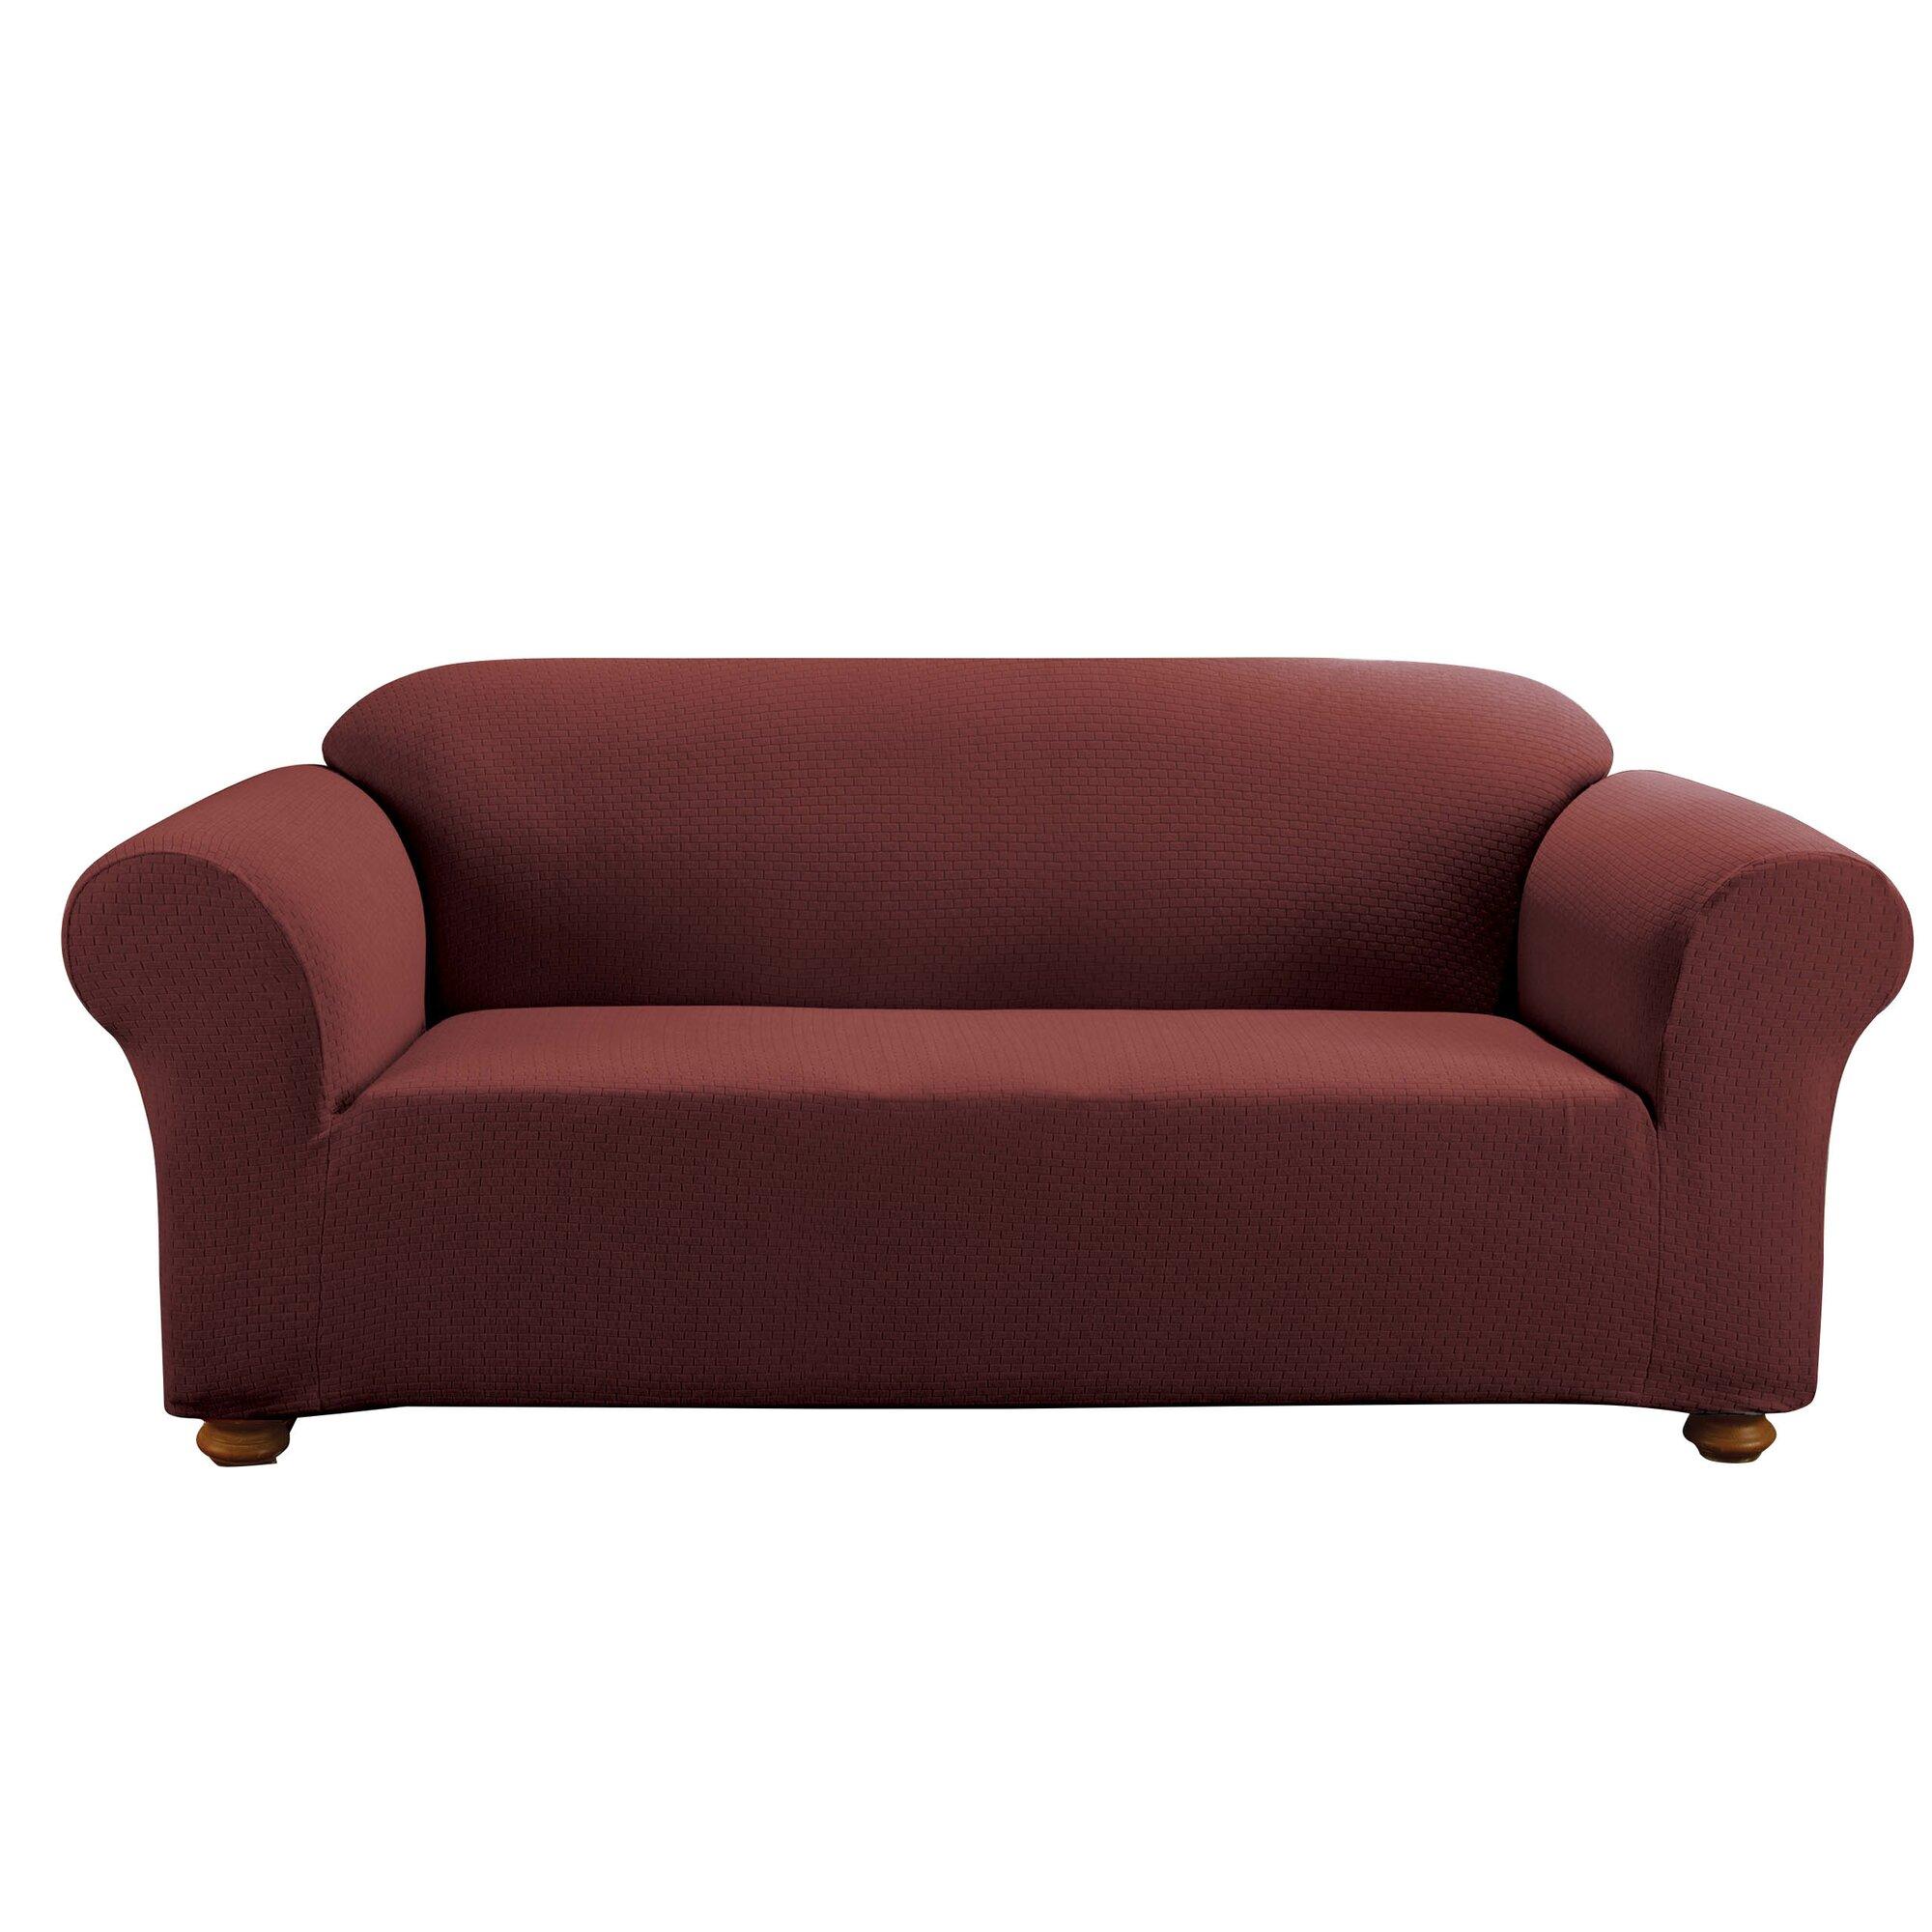 Sure Fit Simple Stretch Subway Sofa Box Cushion Slipcover  : SimpleStretchSubwaySofaBoxCushionSlipcover from www.wayfair.com size 2000 x 2000 jpeg 255kB